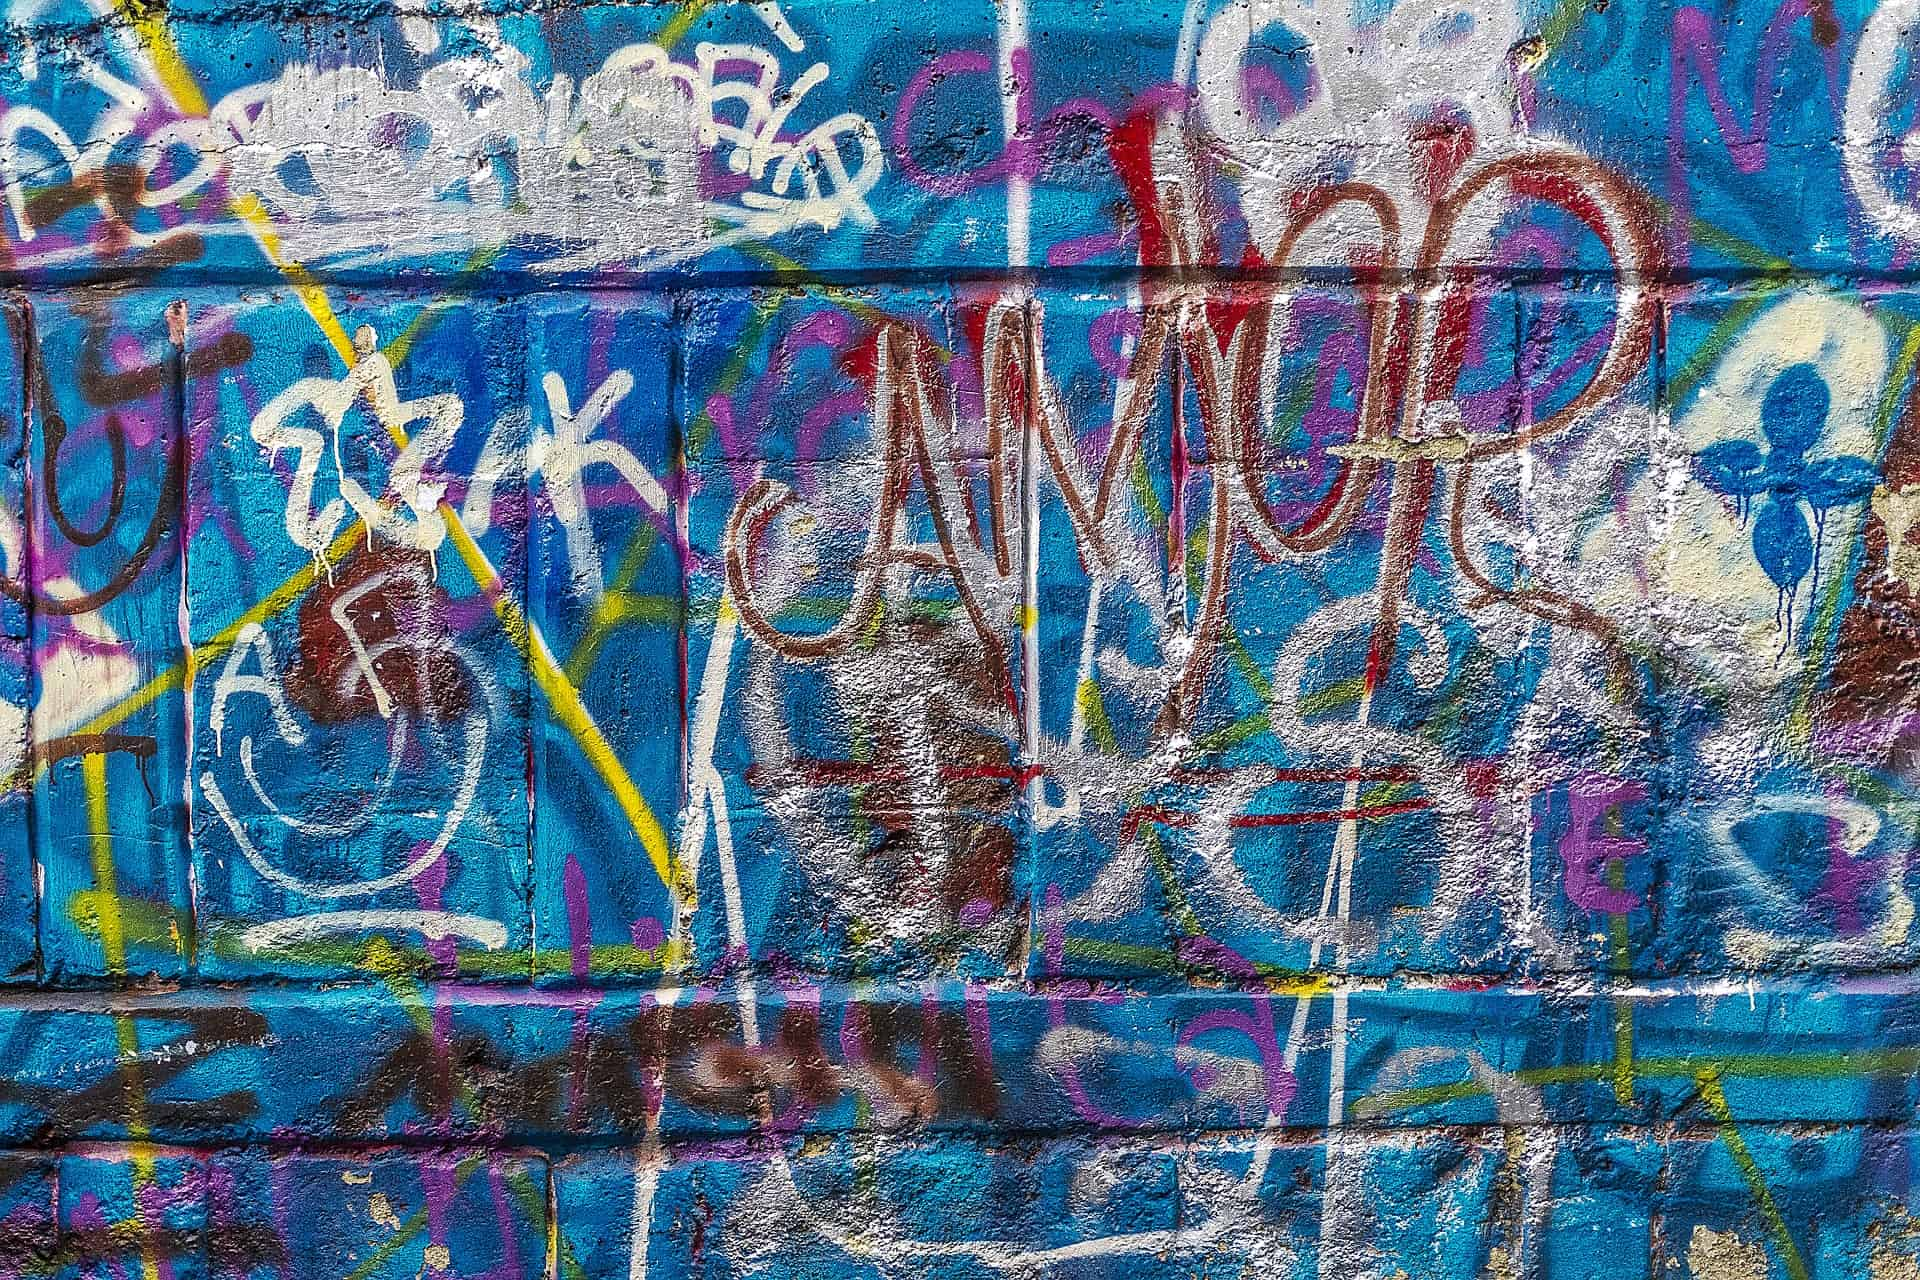 Vandalism Recovery